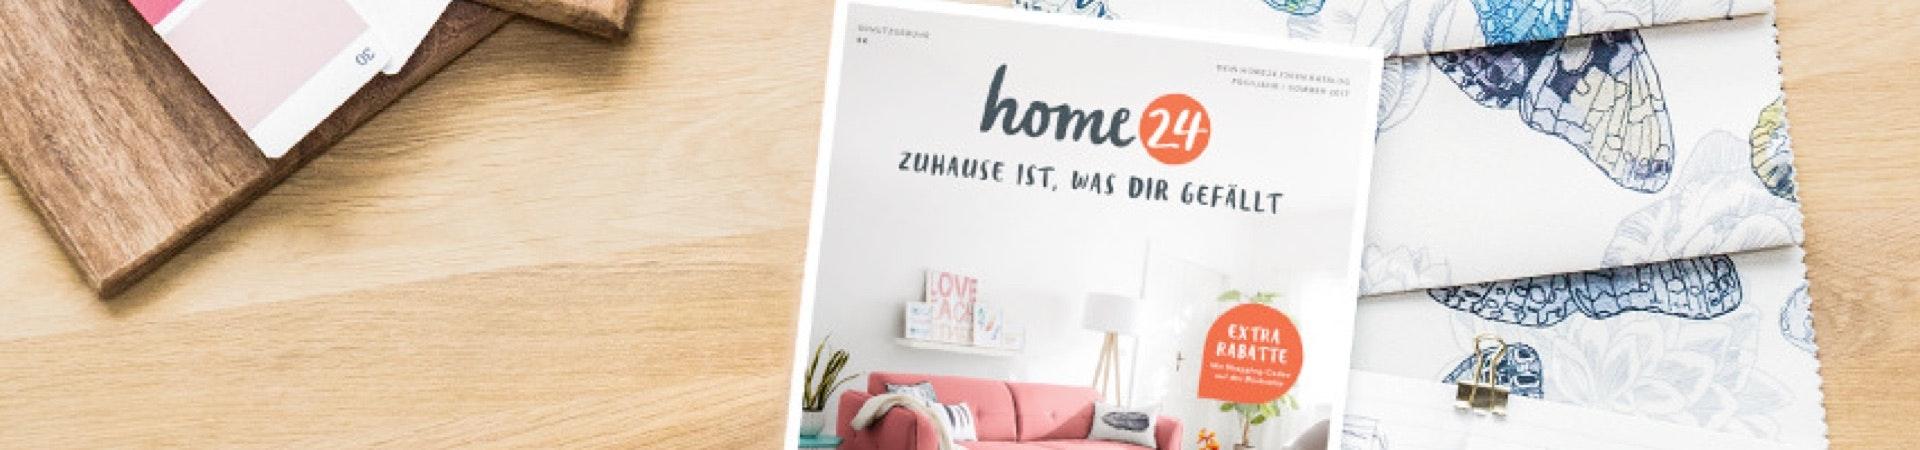 Home24 Ratgeber